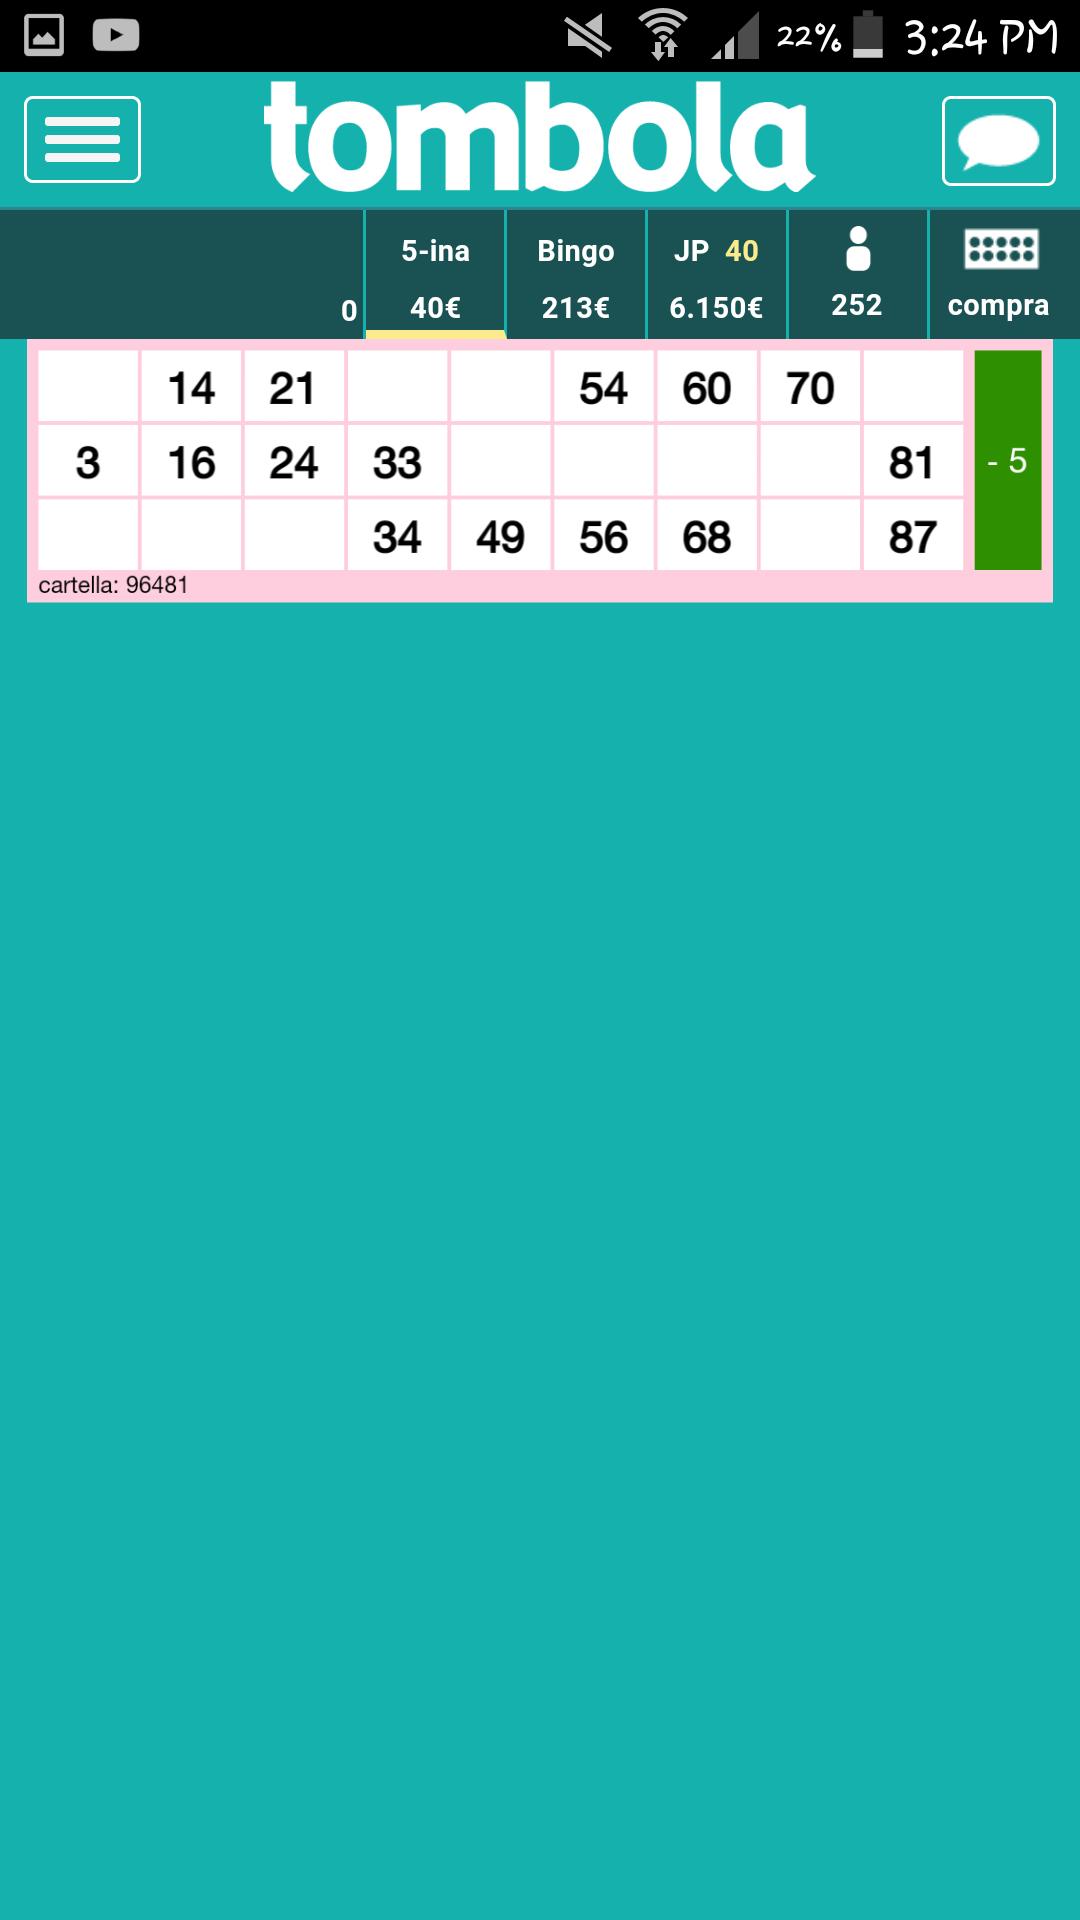 Partita di bingo90